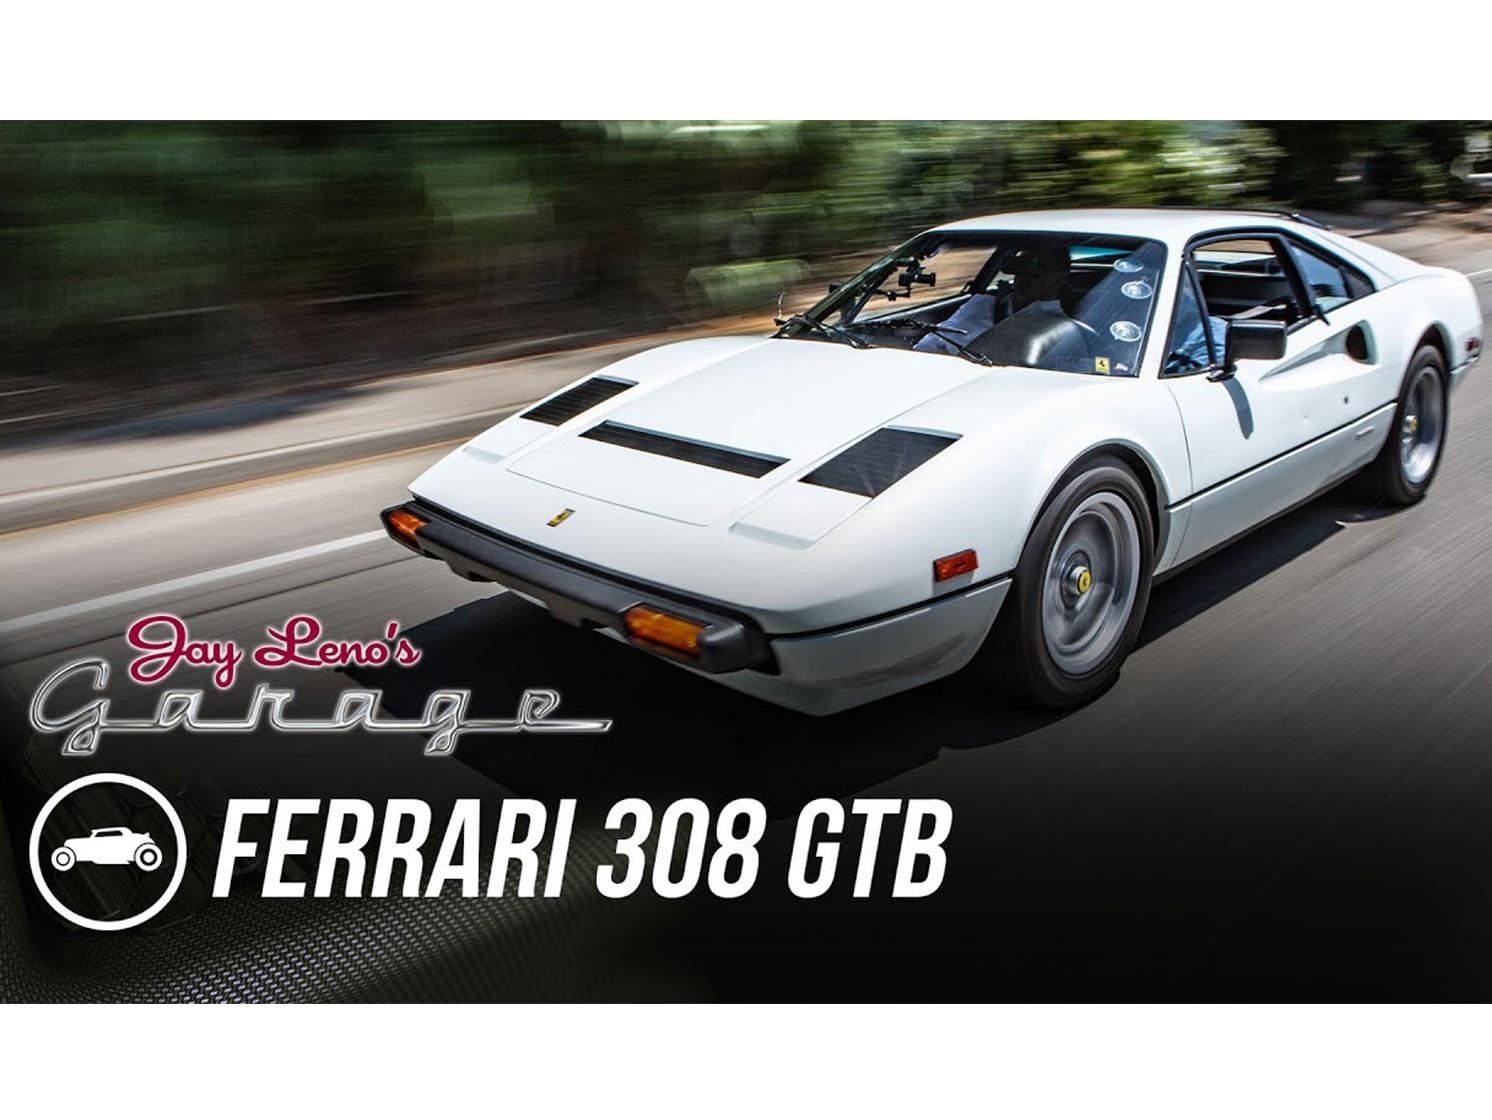 Bellisimo: Jay Leno behind the wheel of a Ferrari 308 thumbnail